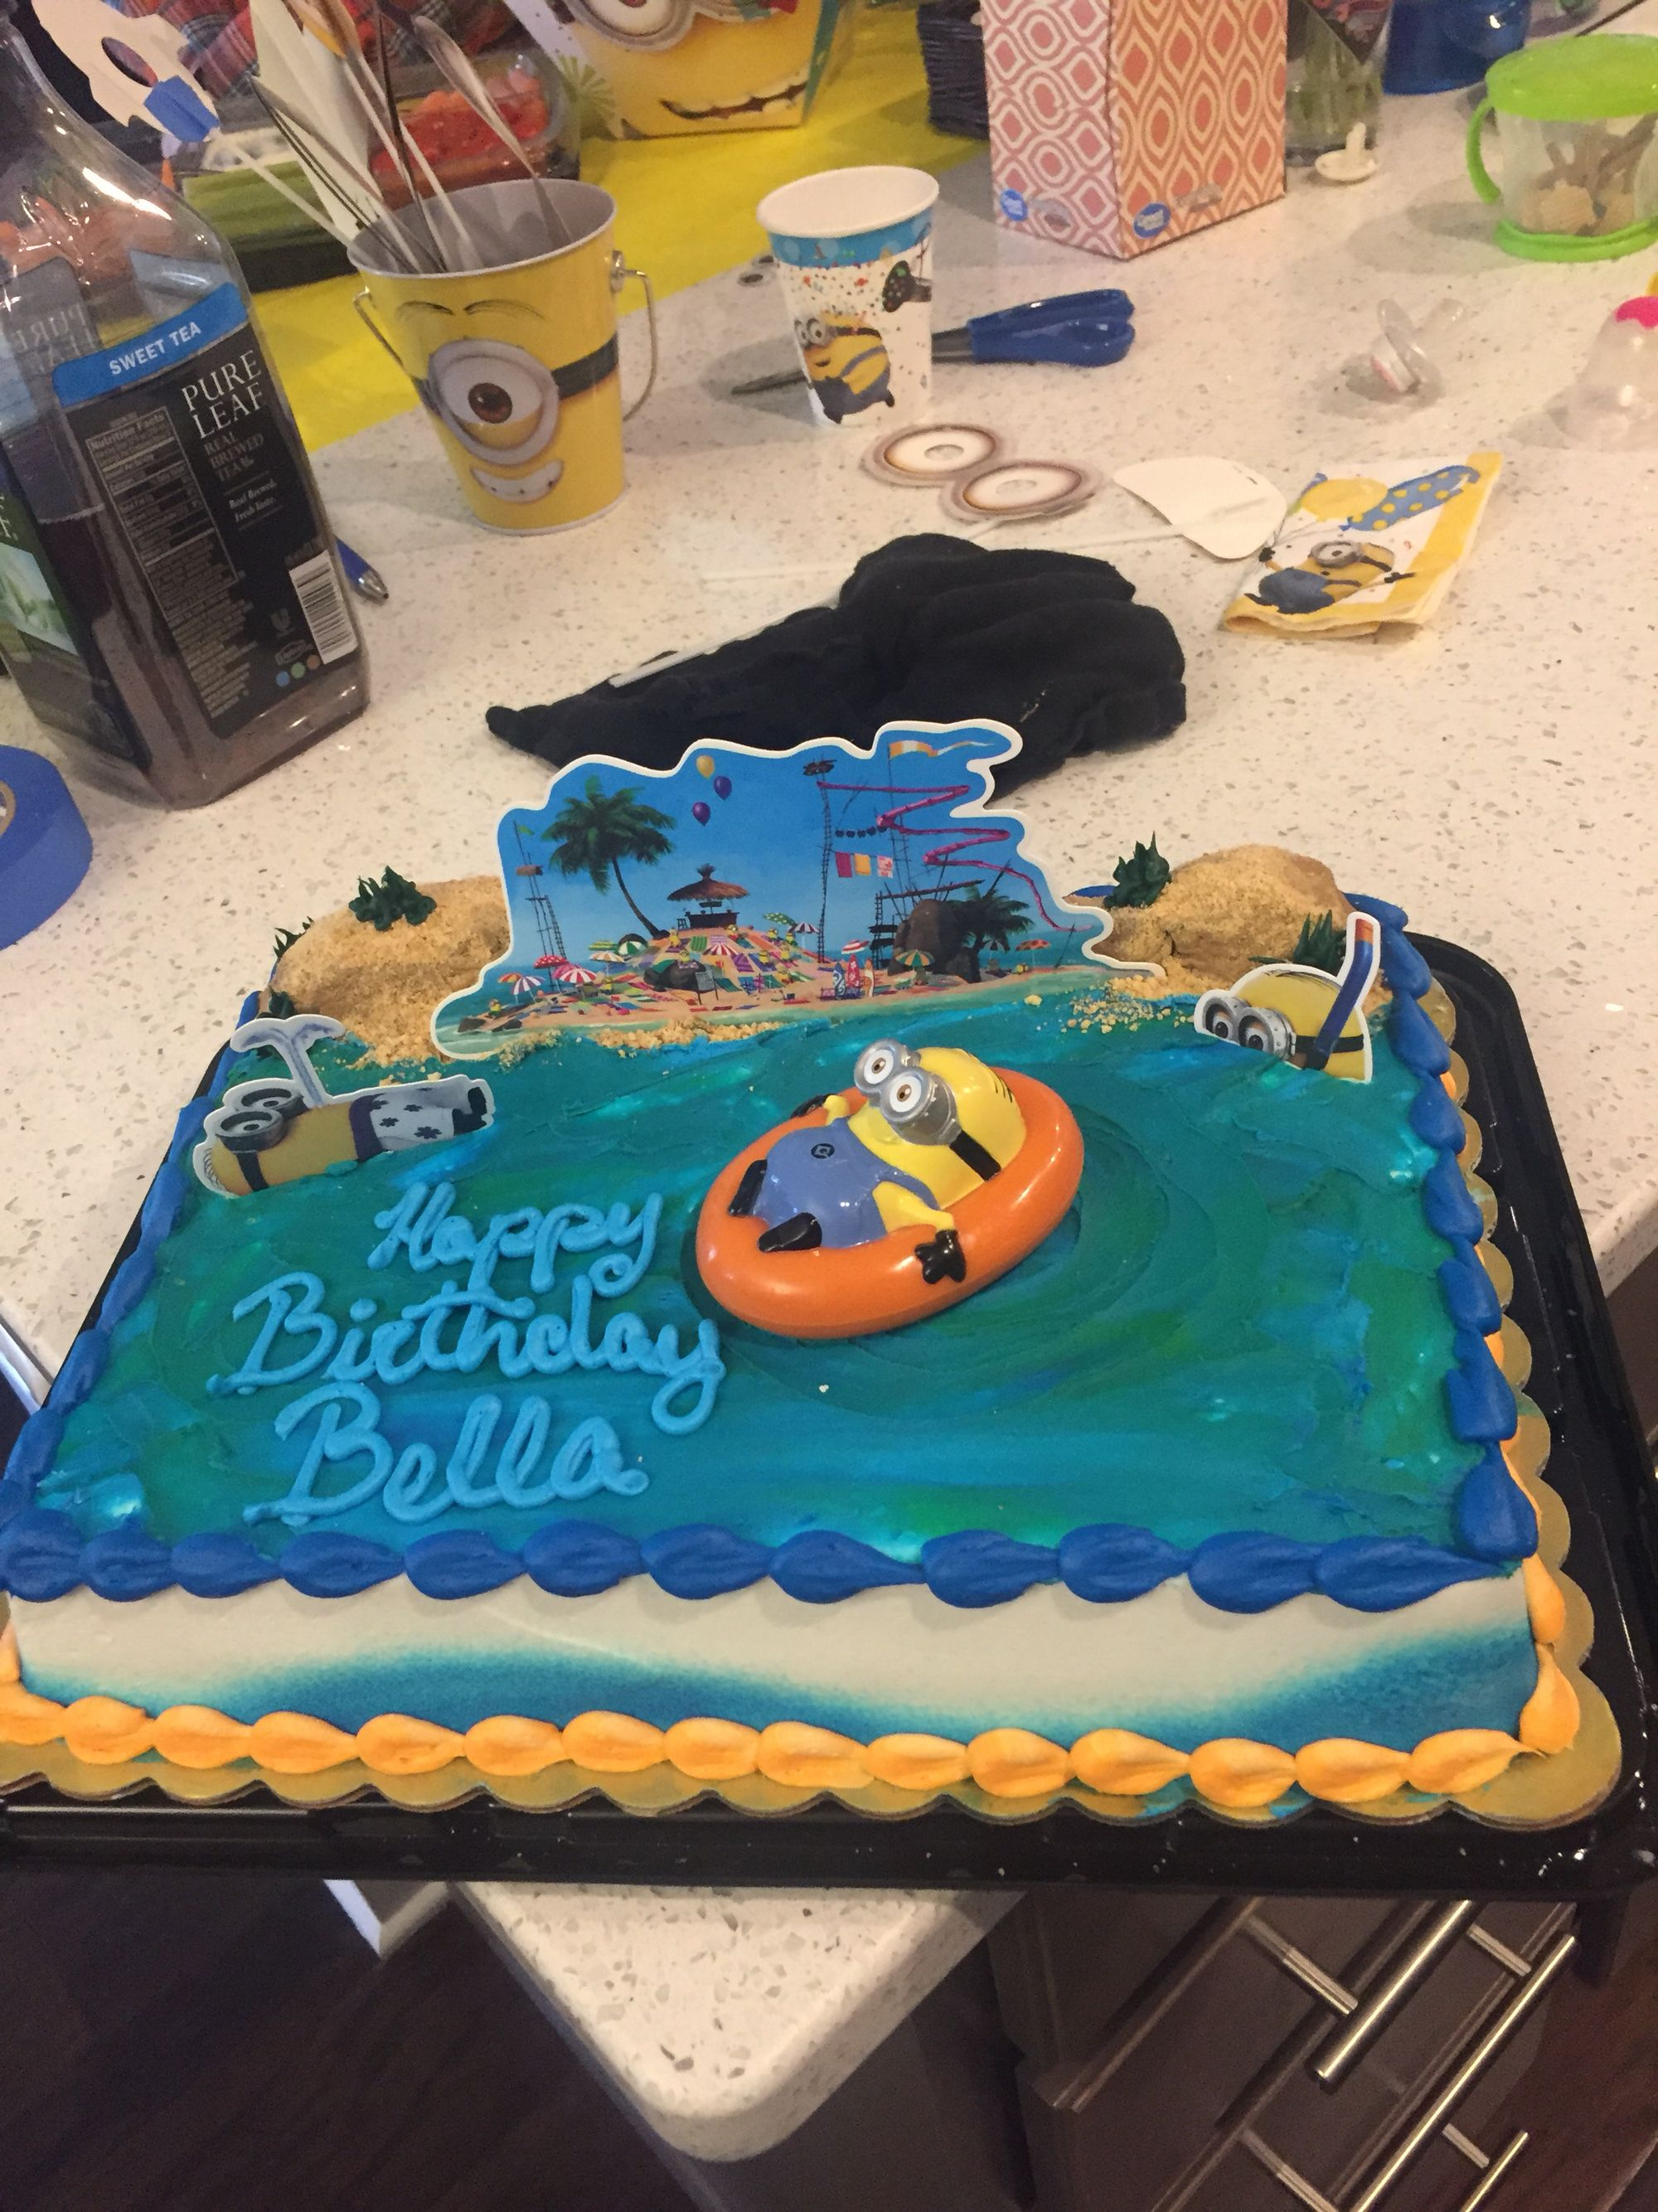 Wondrous Minion Birthday Cake From Harris Teeter Minion Birthday Cake Funny Birthday Cards Online Hendilapandamsfinfo